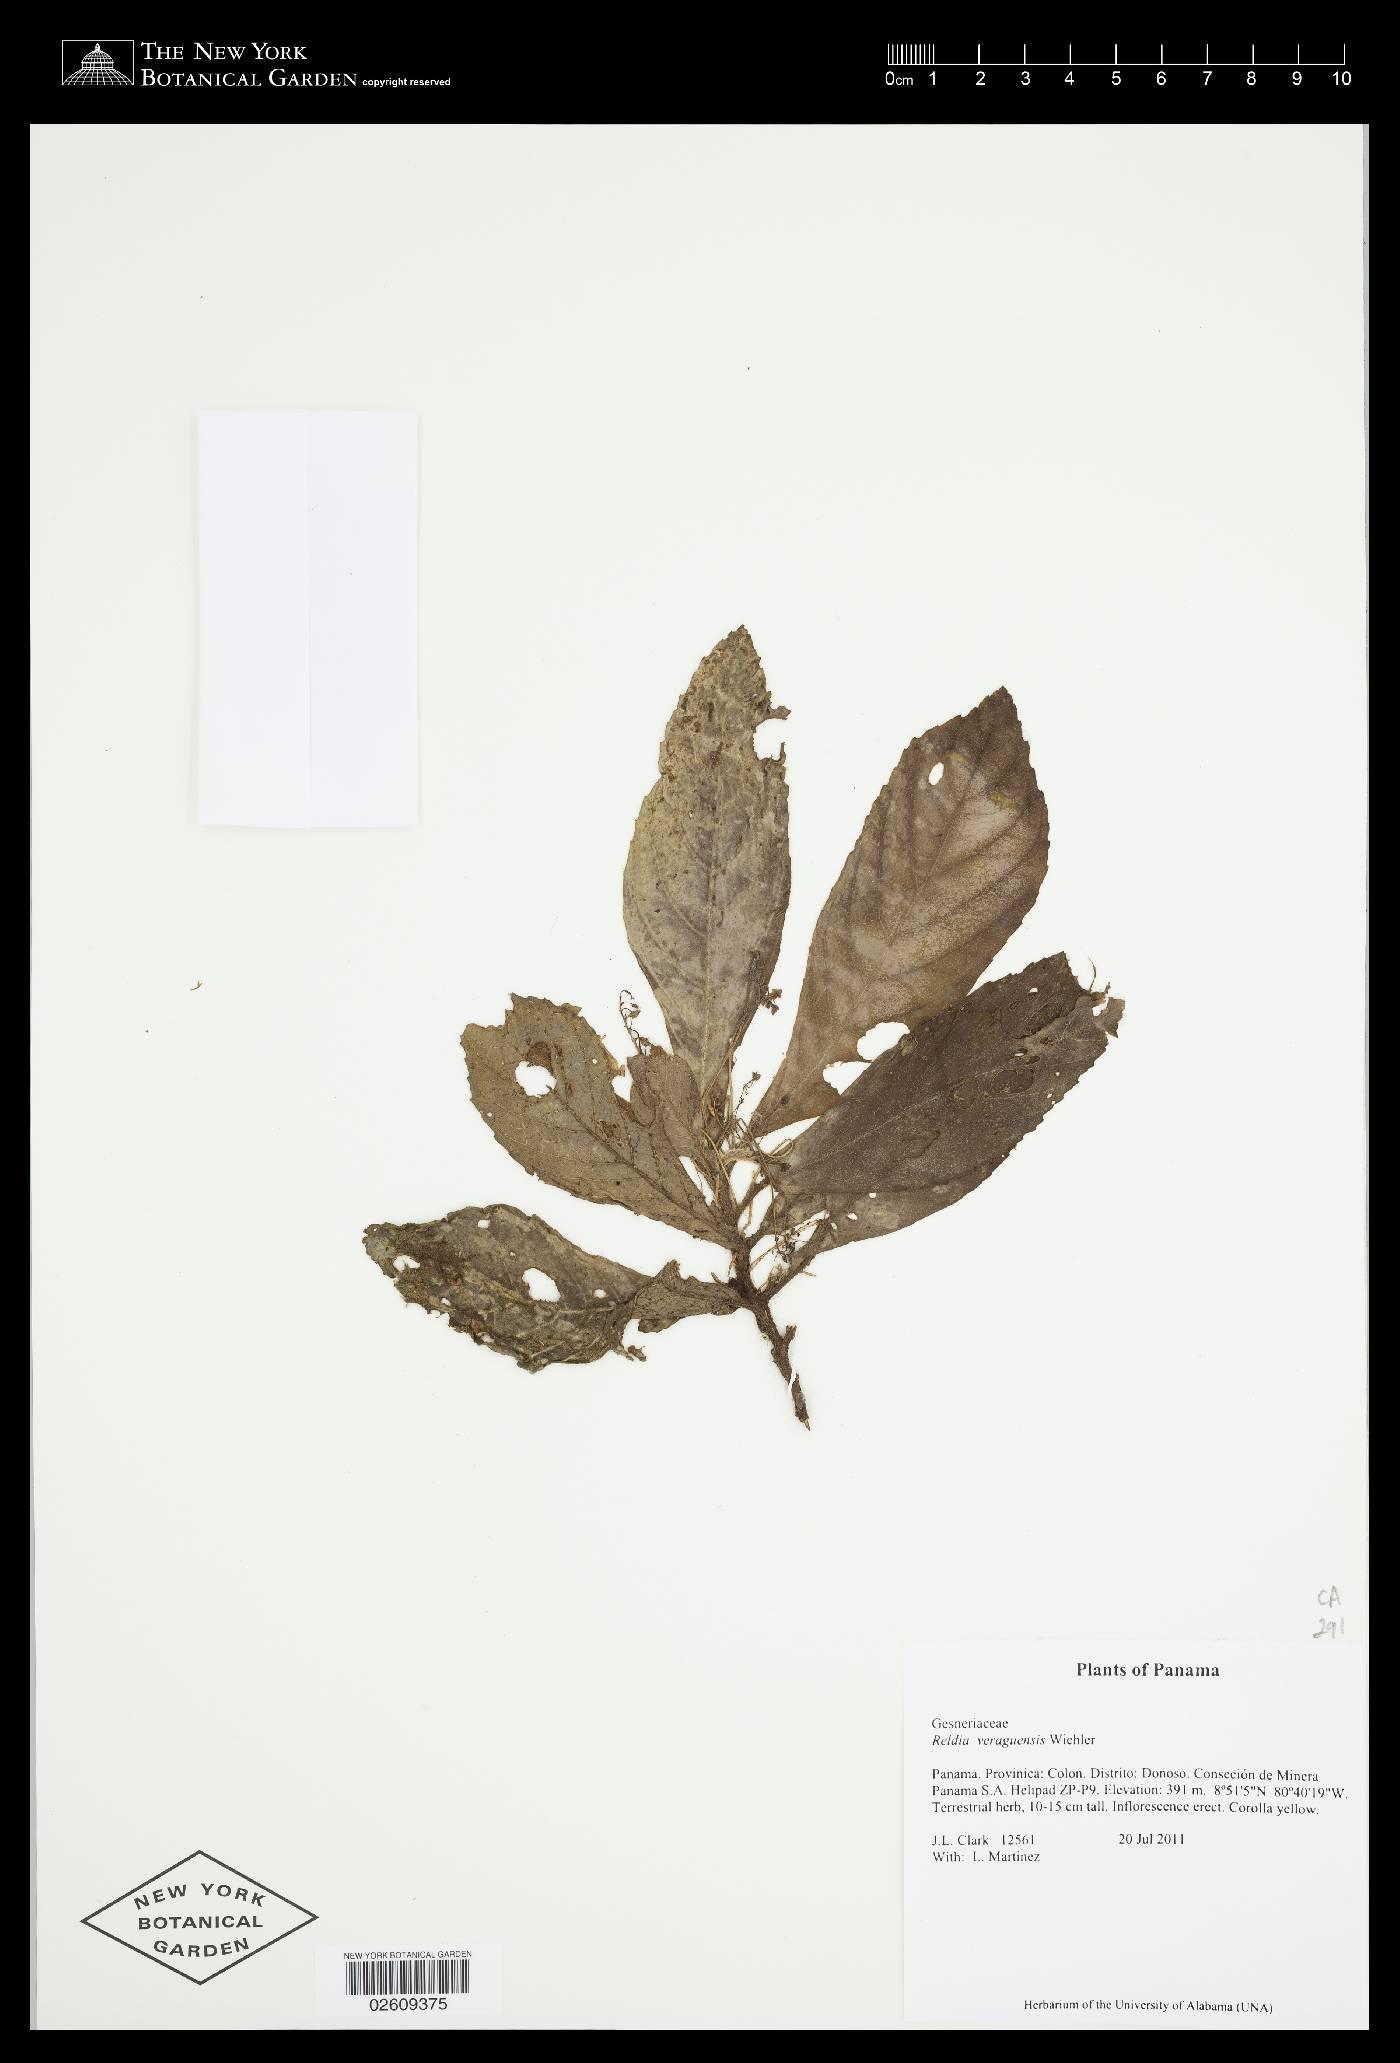 Reldia minutiflora image